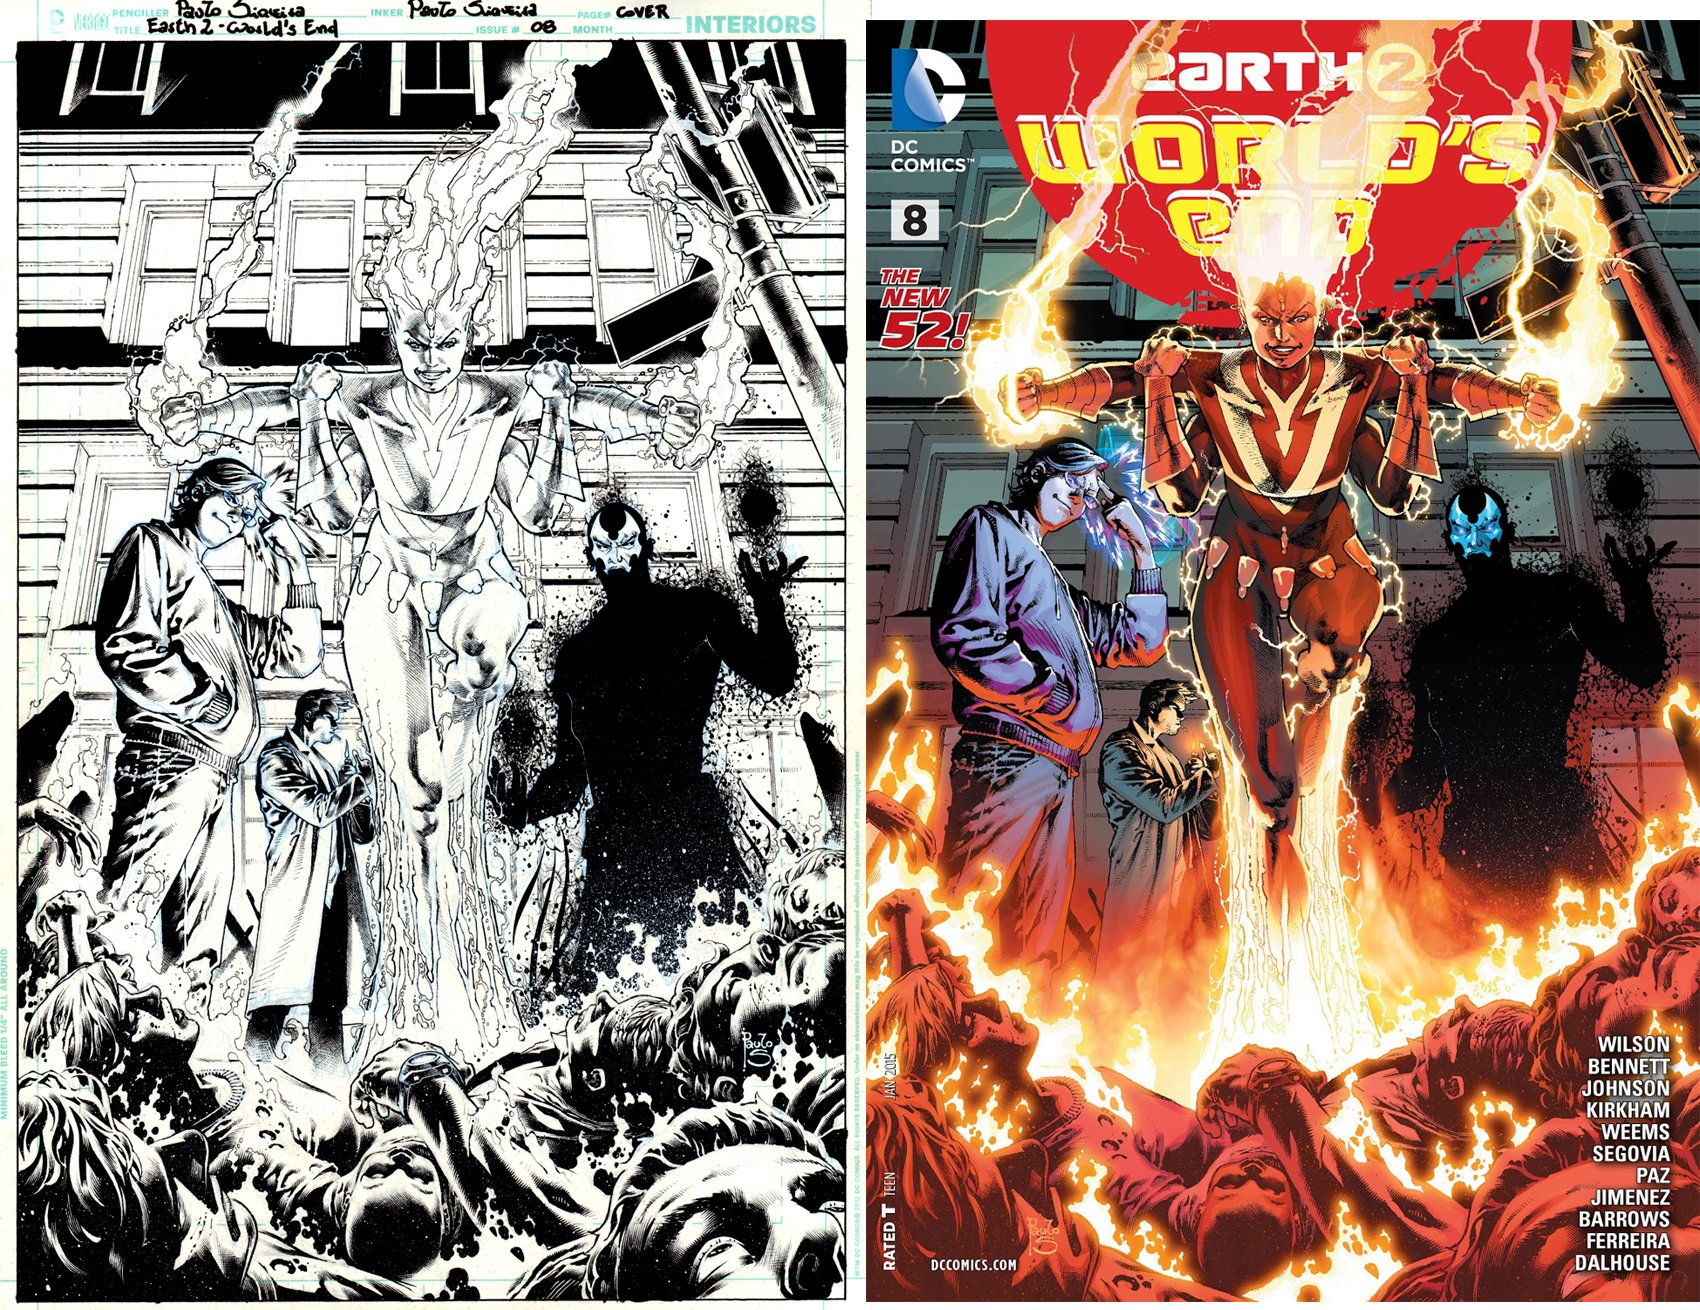 Earth 2 World's End #8 Cover (Jonni Thunder; Brainwave; Obsidian; Smoking John Constantine!) 2014